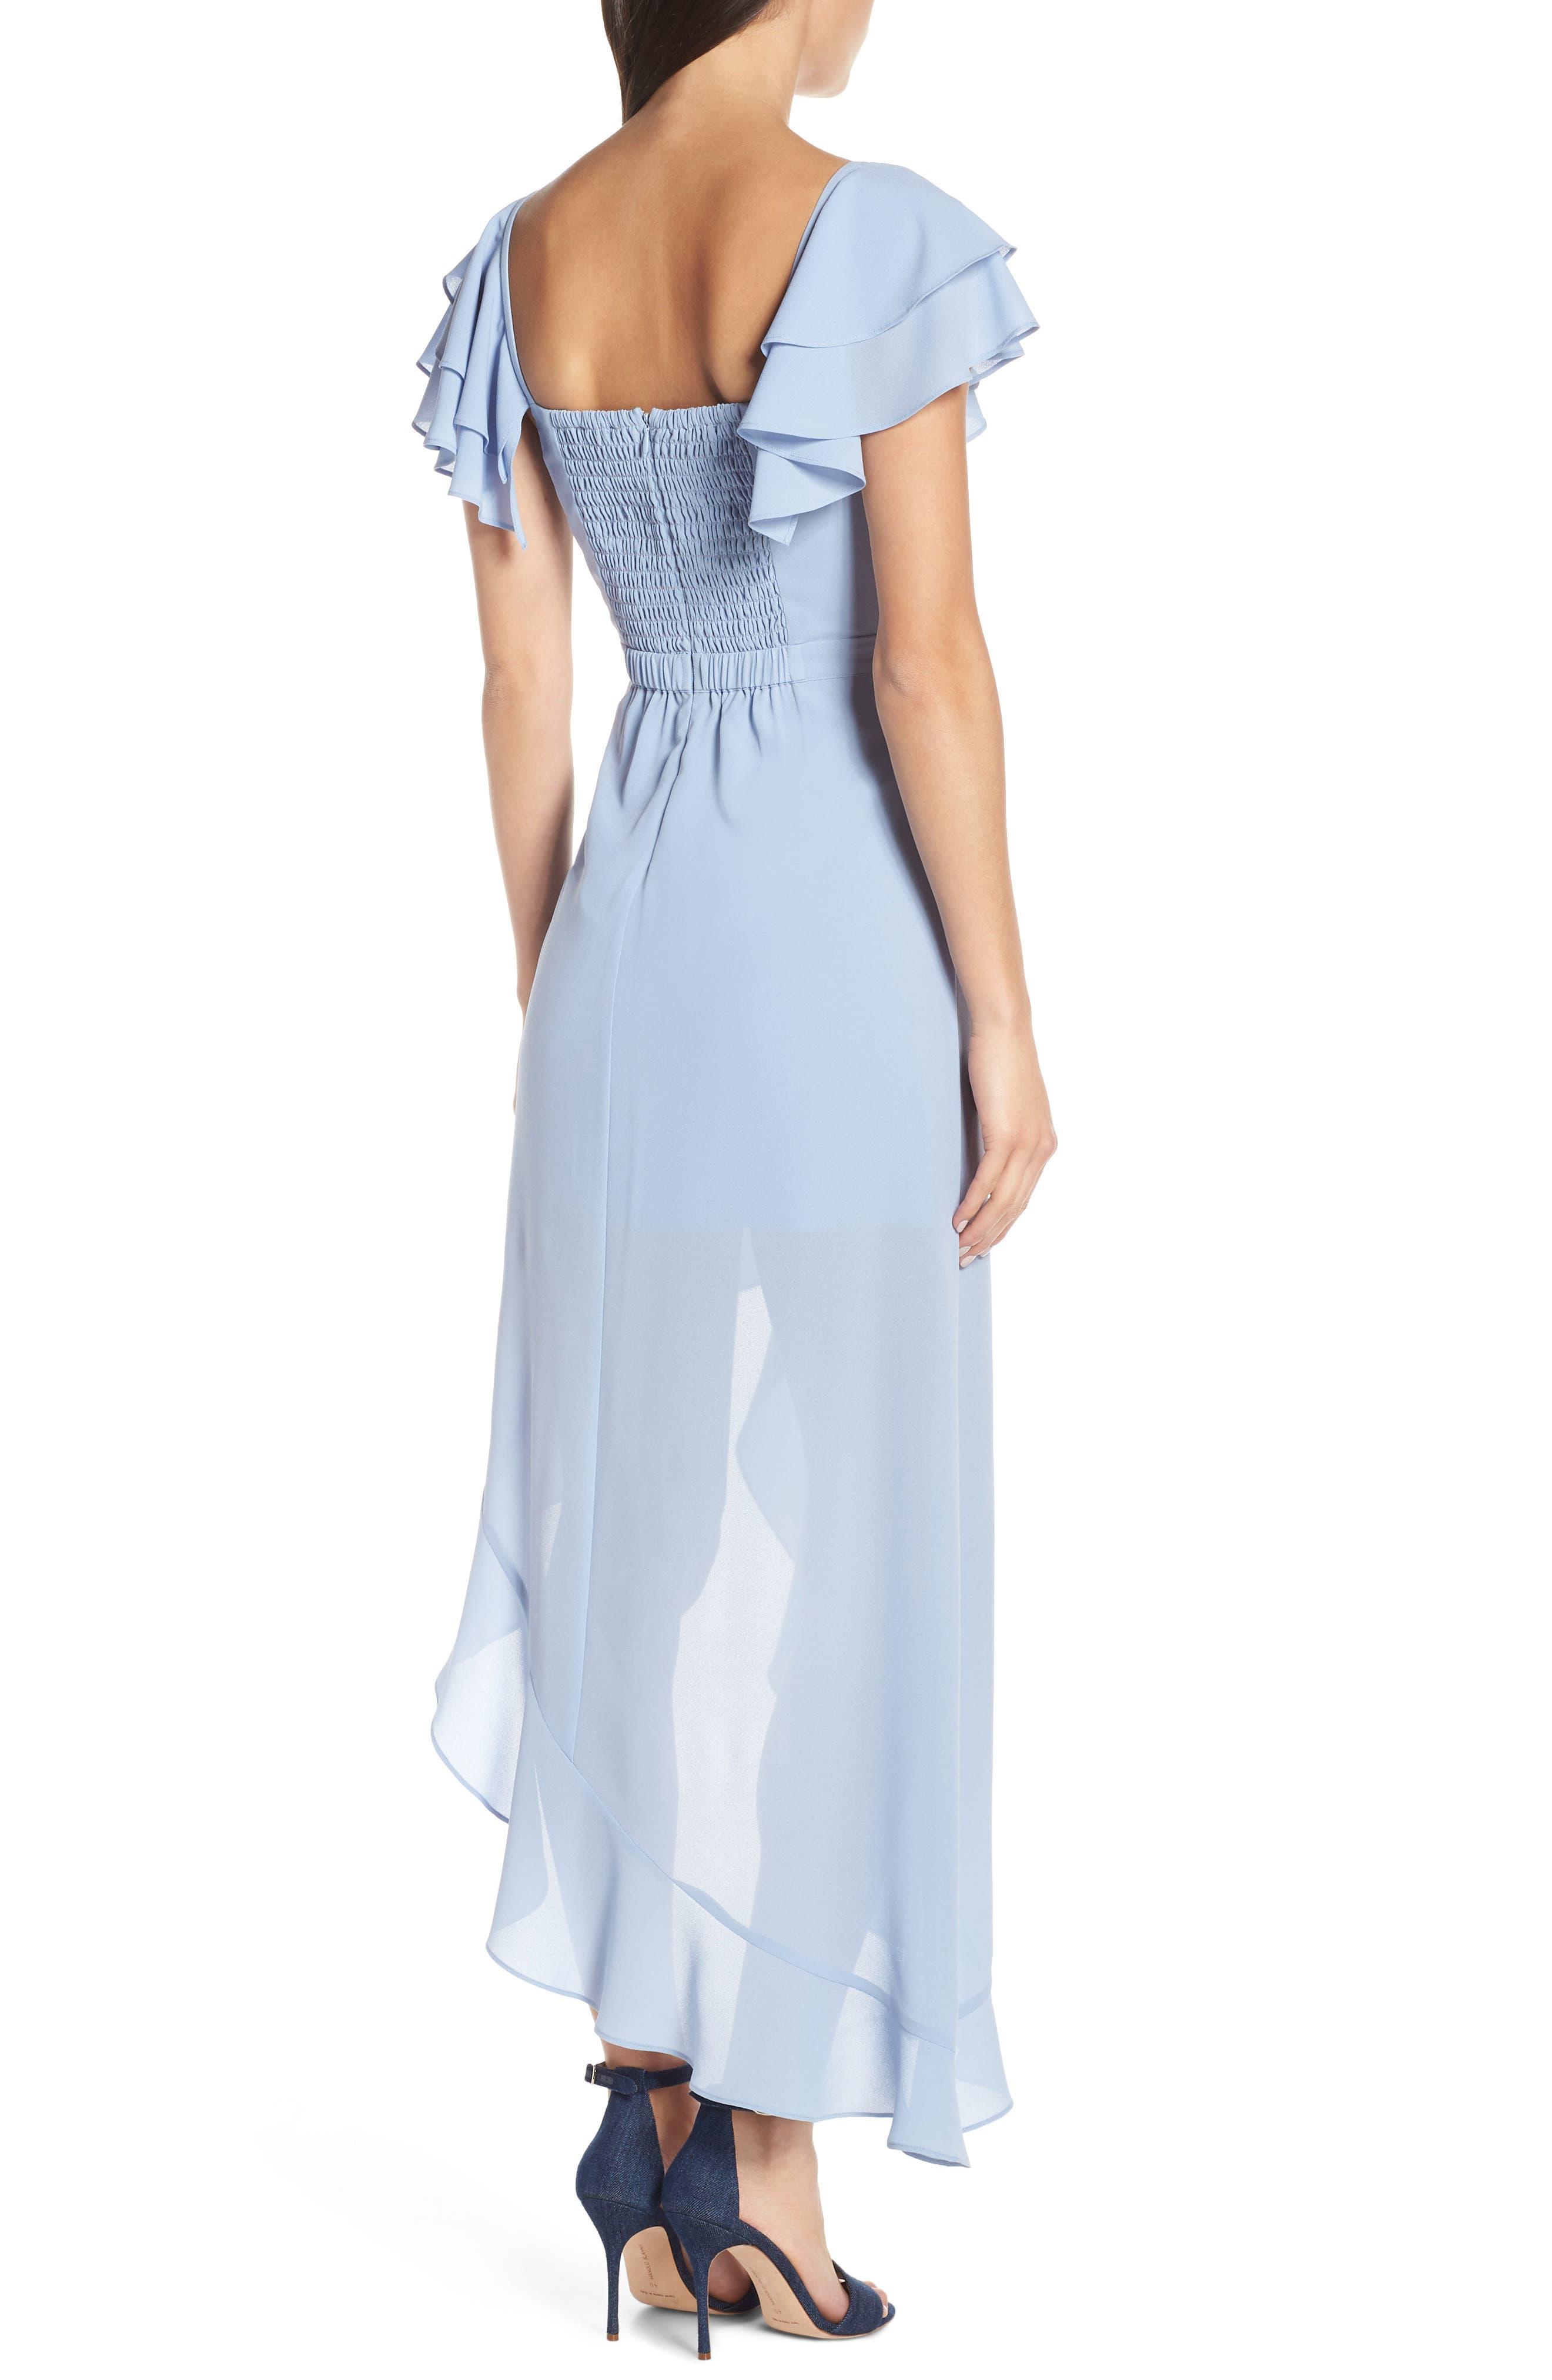 ALI & JAY, Terrace Time Asymmetrical Maxi Dress, Alternate thumbnail 2, color, 400